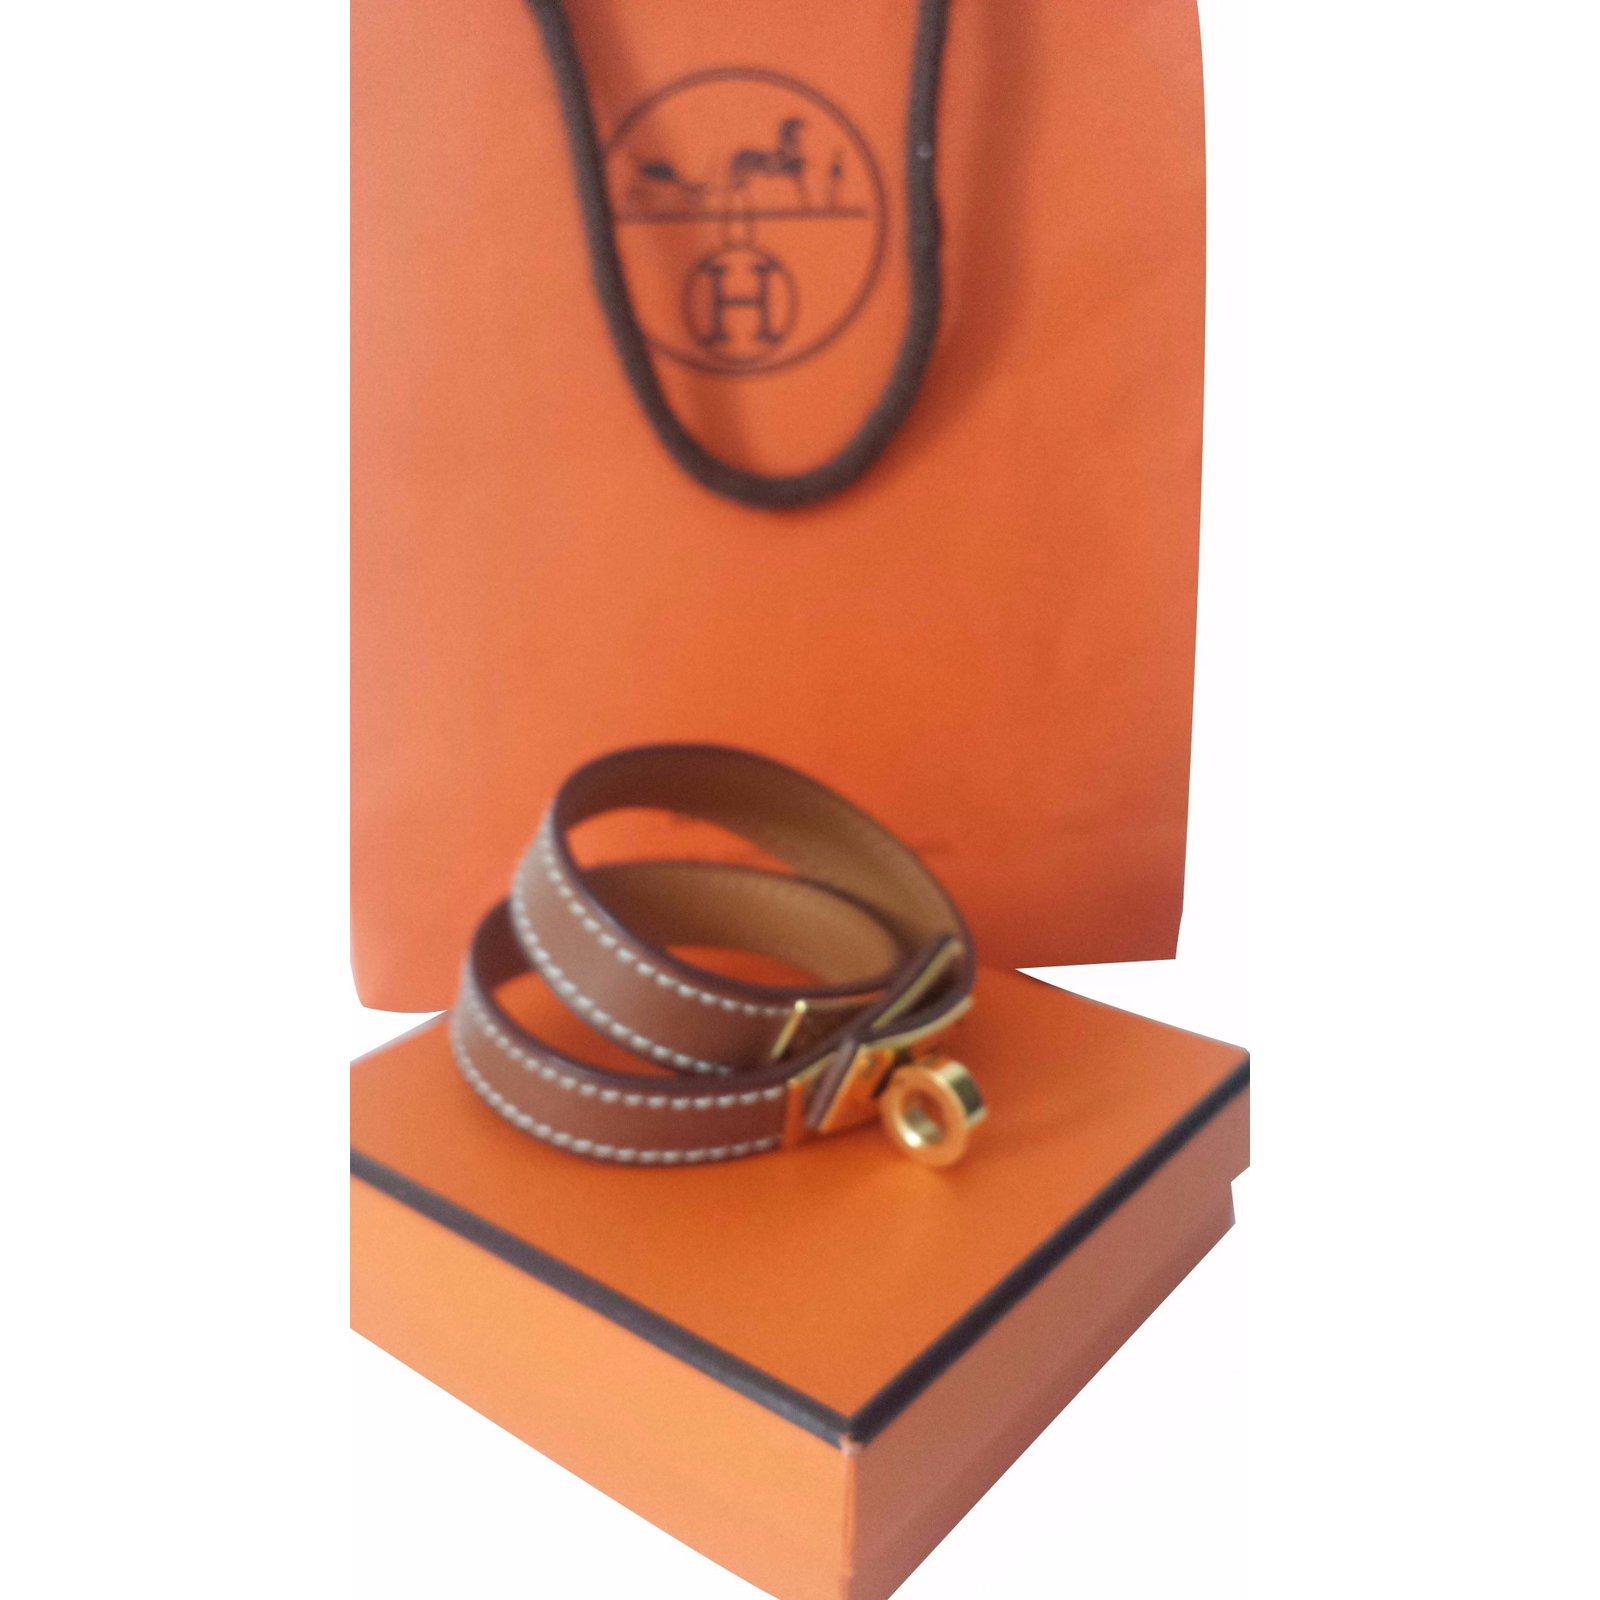 ... facebook pin this. bracelets hermès kelly double tour 6e868675bbd